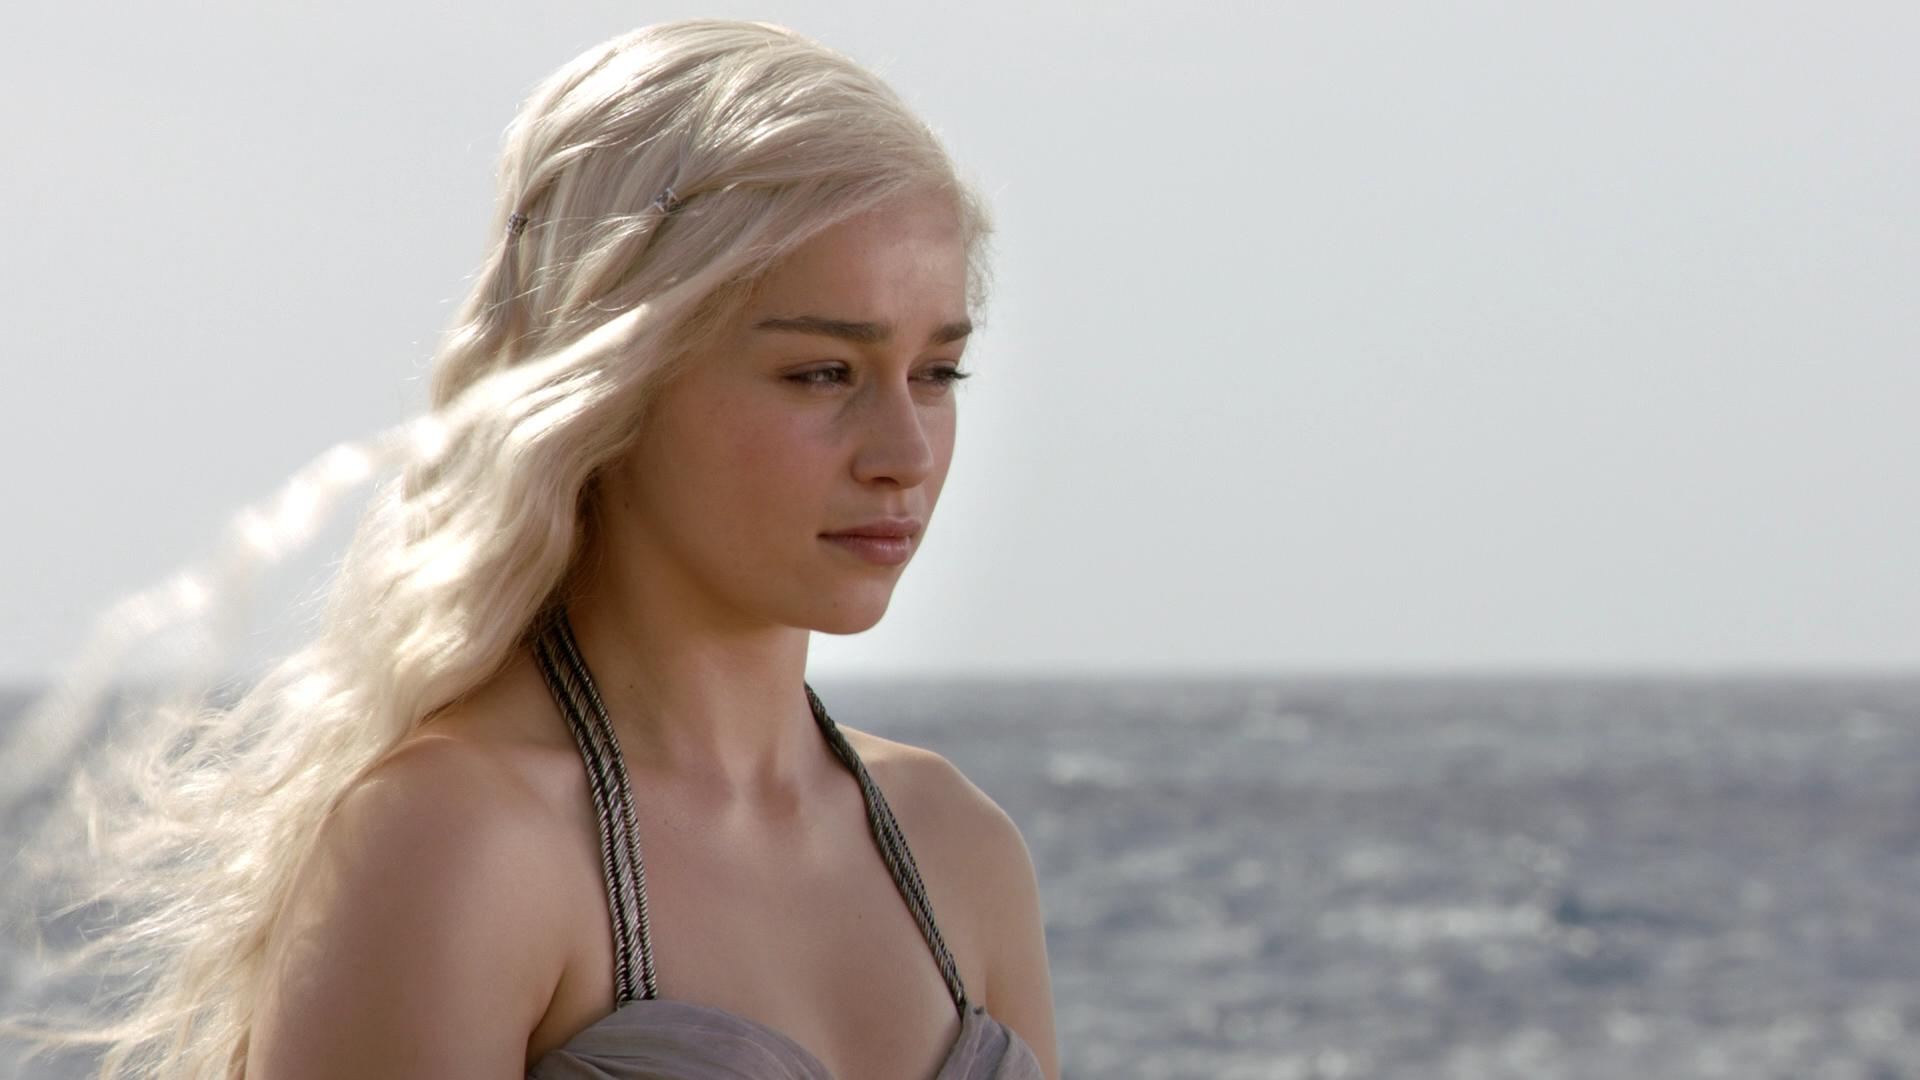 People 1920x1080 Daenerys Targaryen Game of Thrones Emilia Clarke women blonde sea sky women outdoors outdoors long hair celebrity actress TV Series fantasy girl